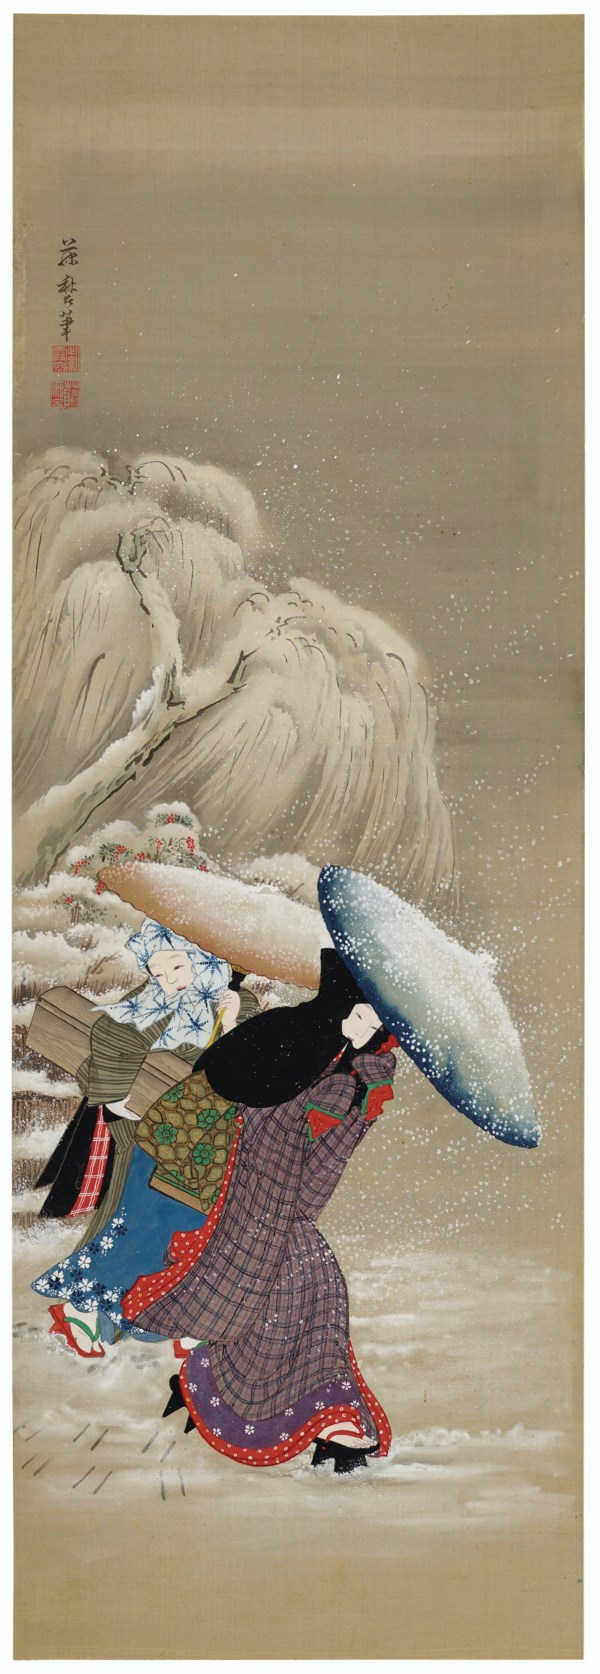 KAWASE HASUI (1883-1957), Yakushiji Temple, Nara (Nara Yakushiji) |  Christie's